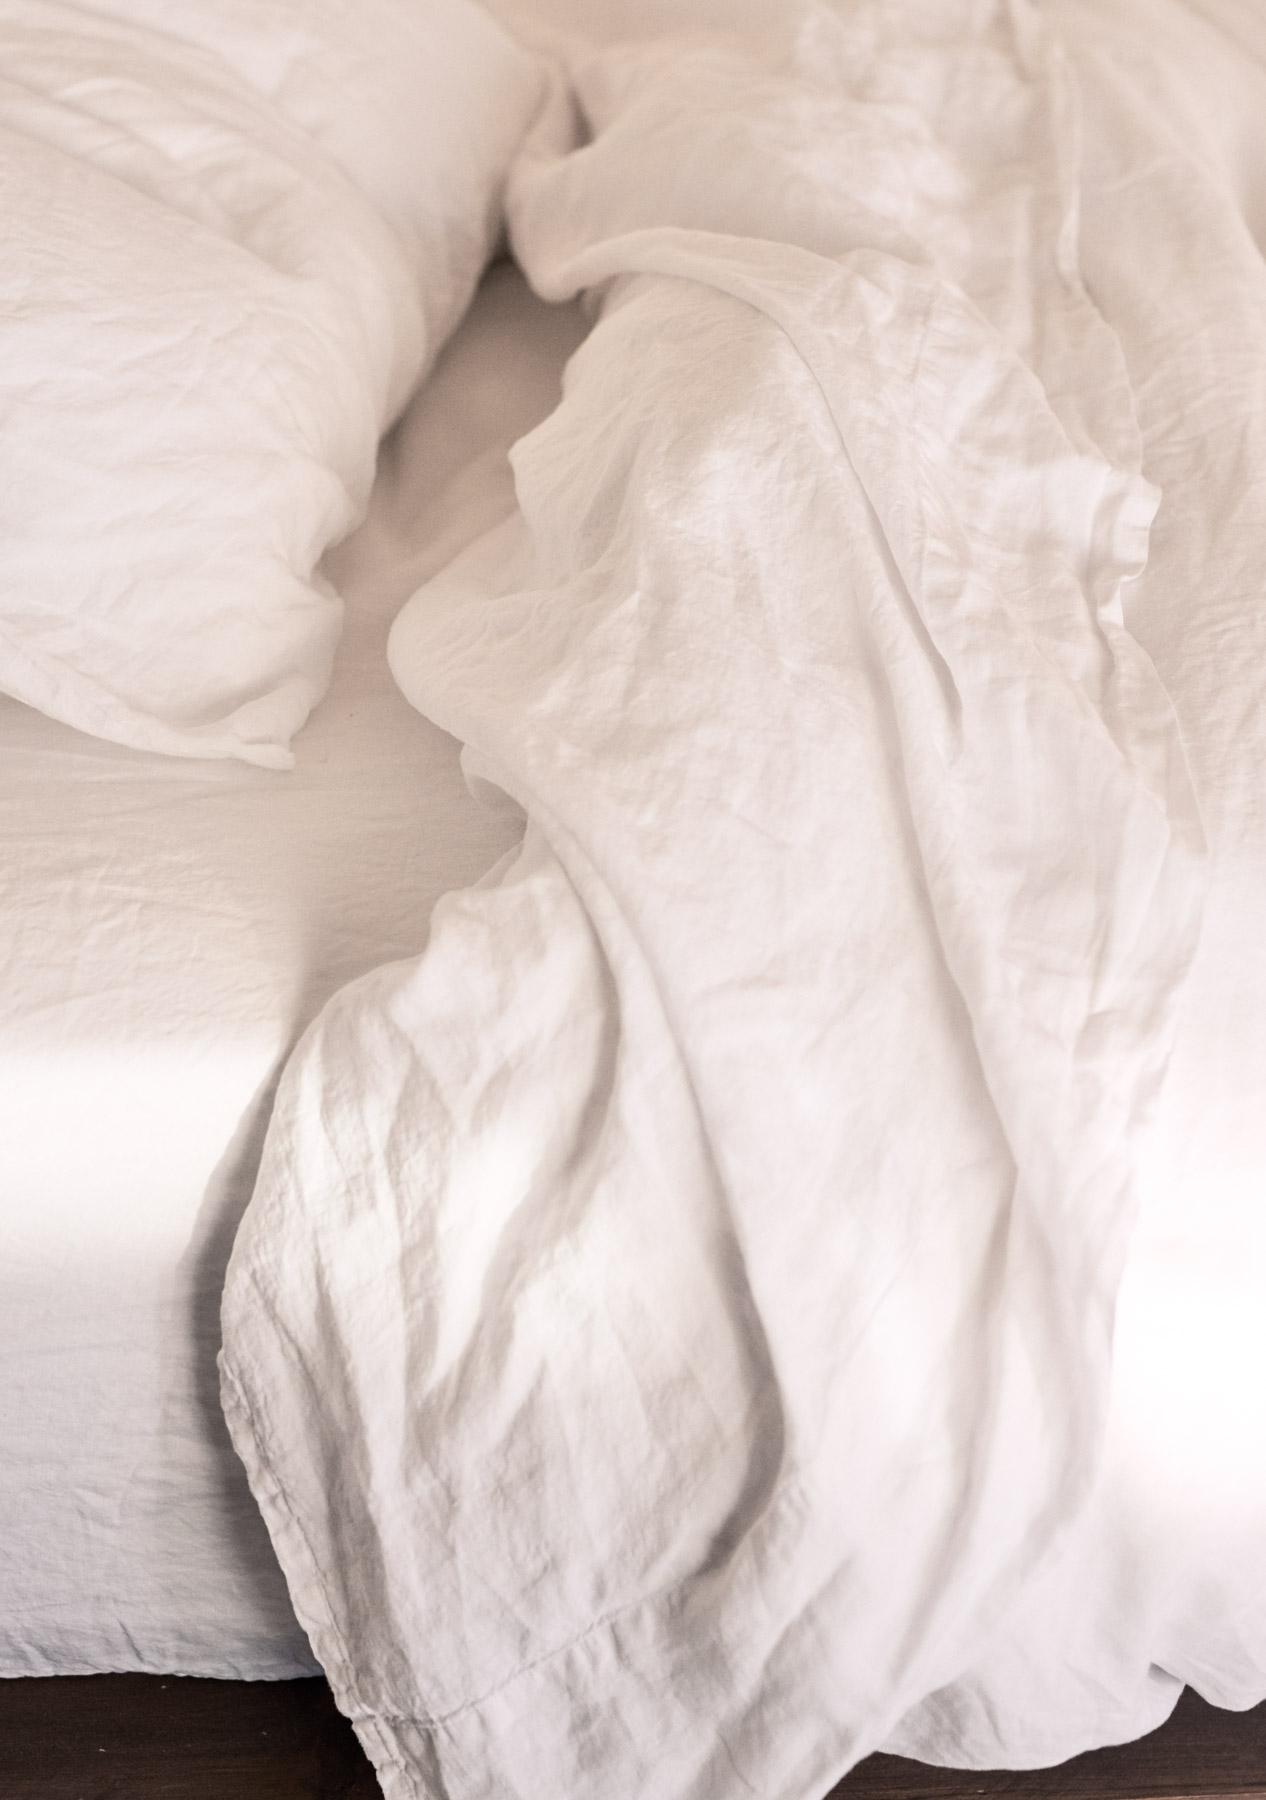 Parachute, Justin Chung, Joshua Tree